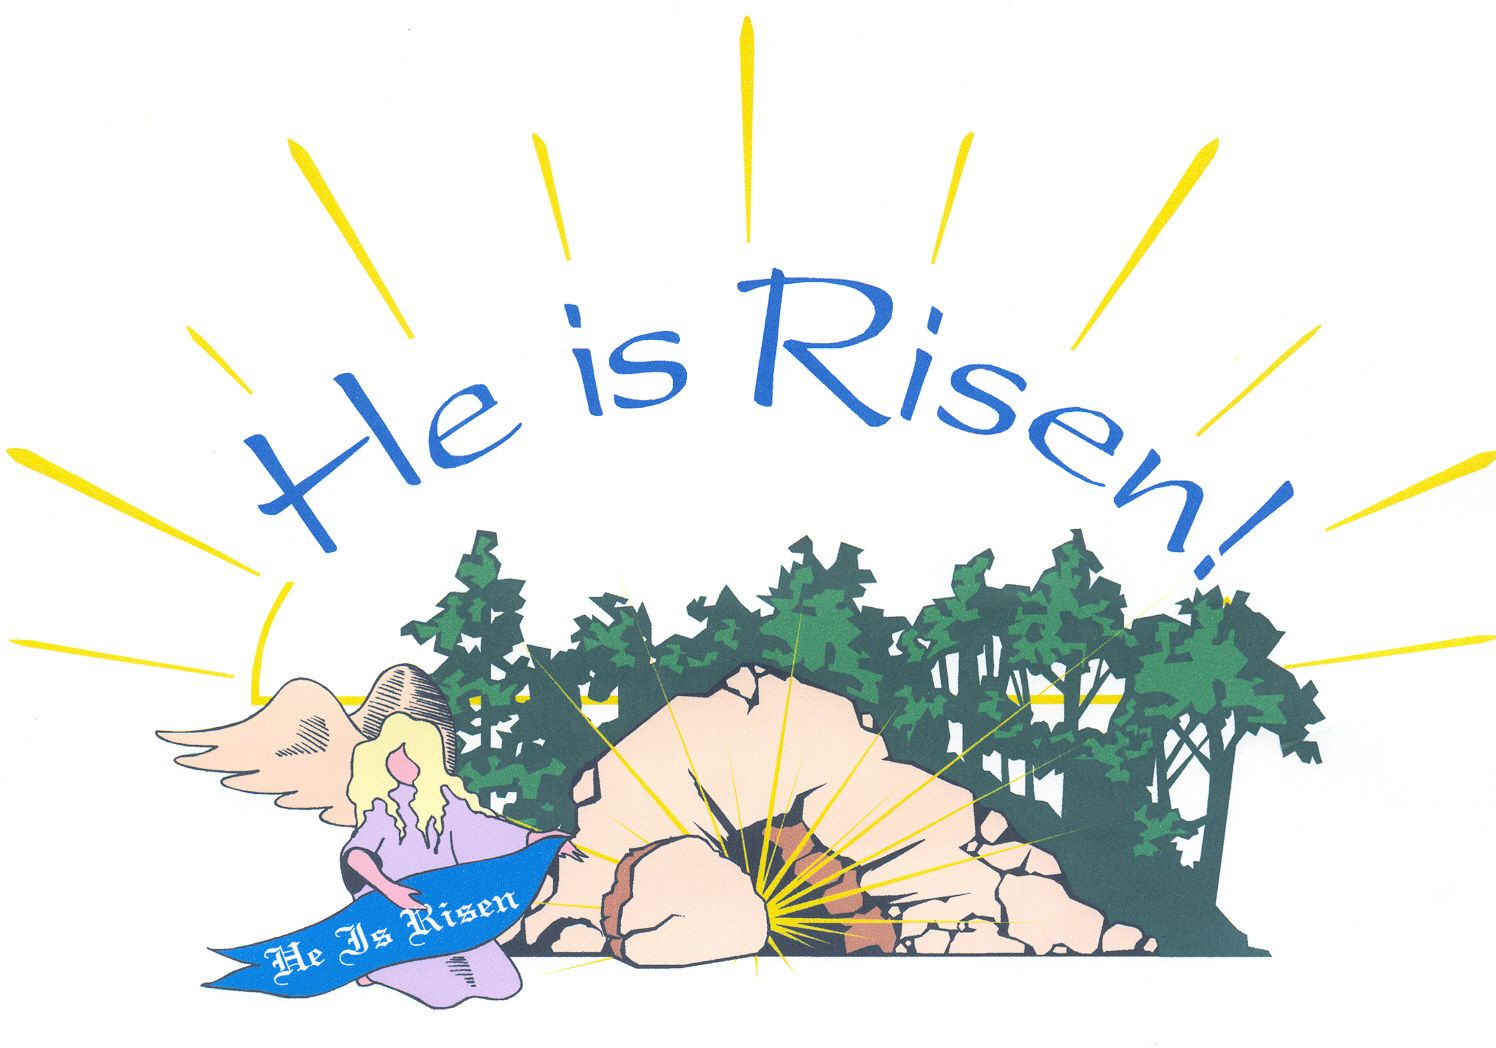 free christian clip art free christian wallpaper jesus is risen he is risen [ 1496 x 1048 Pixel ]